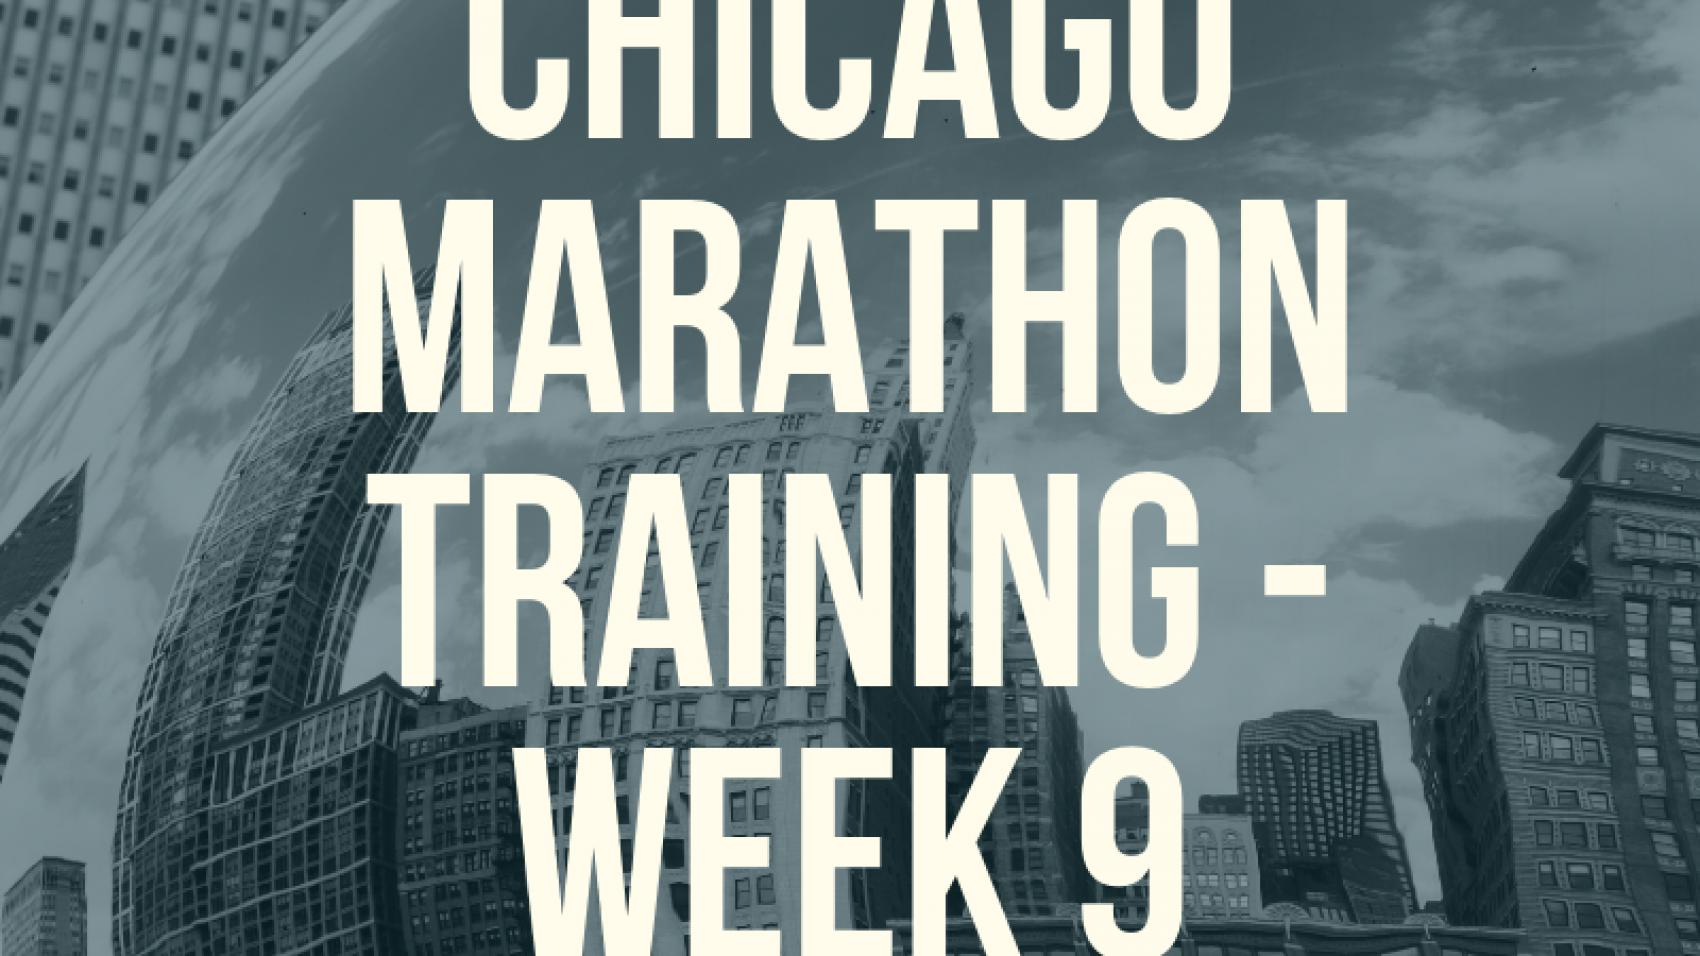 Copy of Copy of Chicago Marathon Training